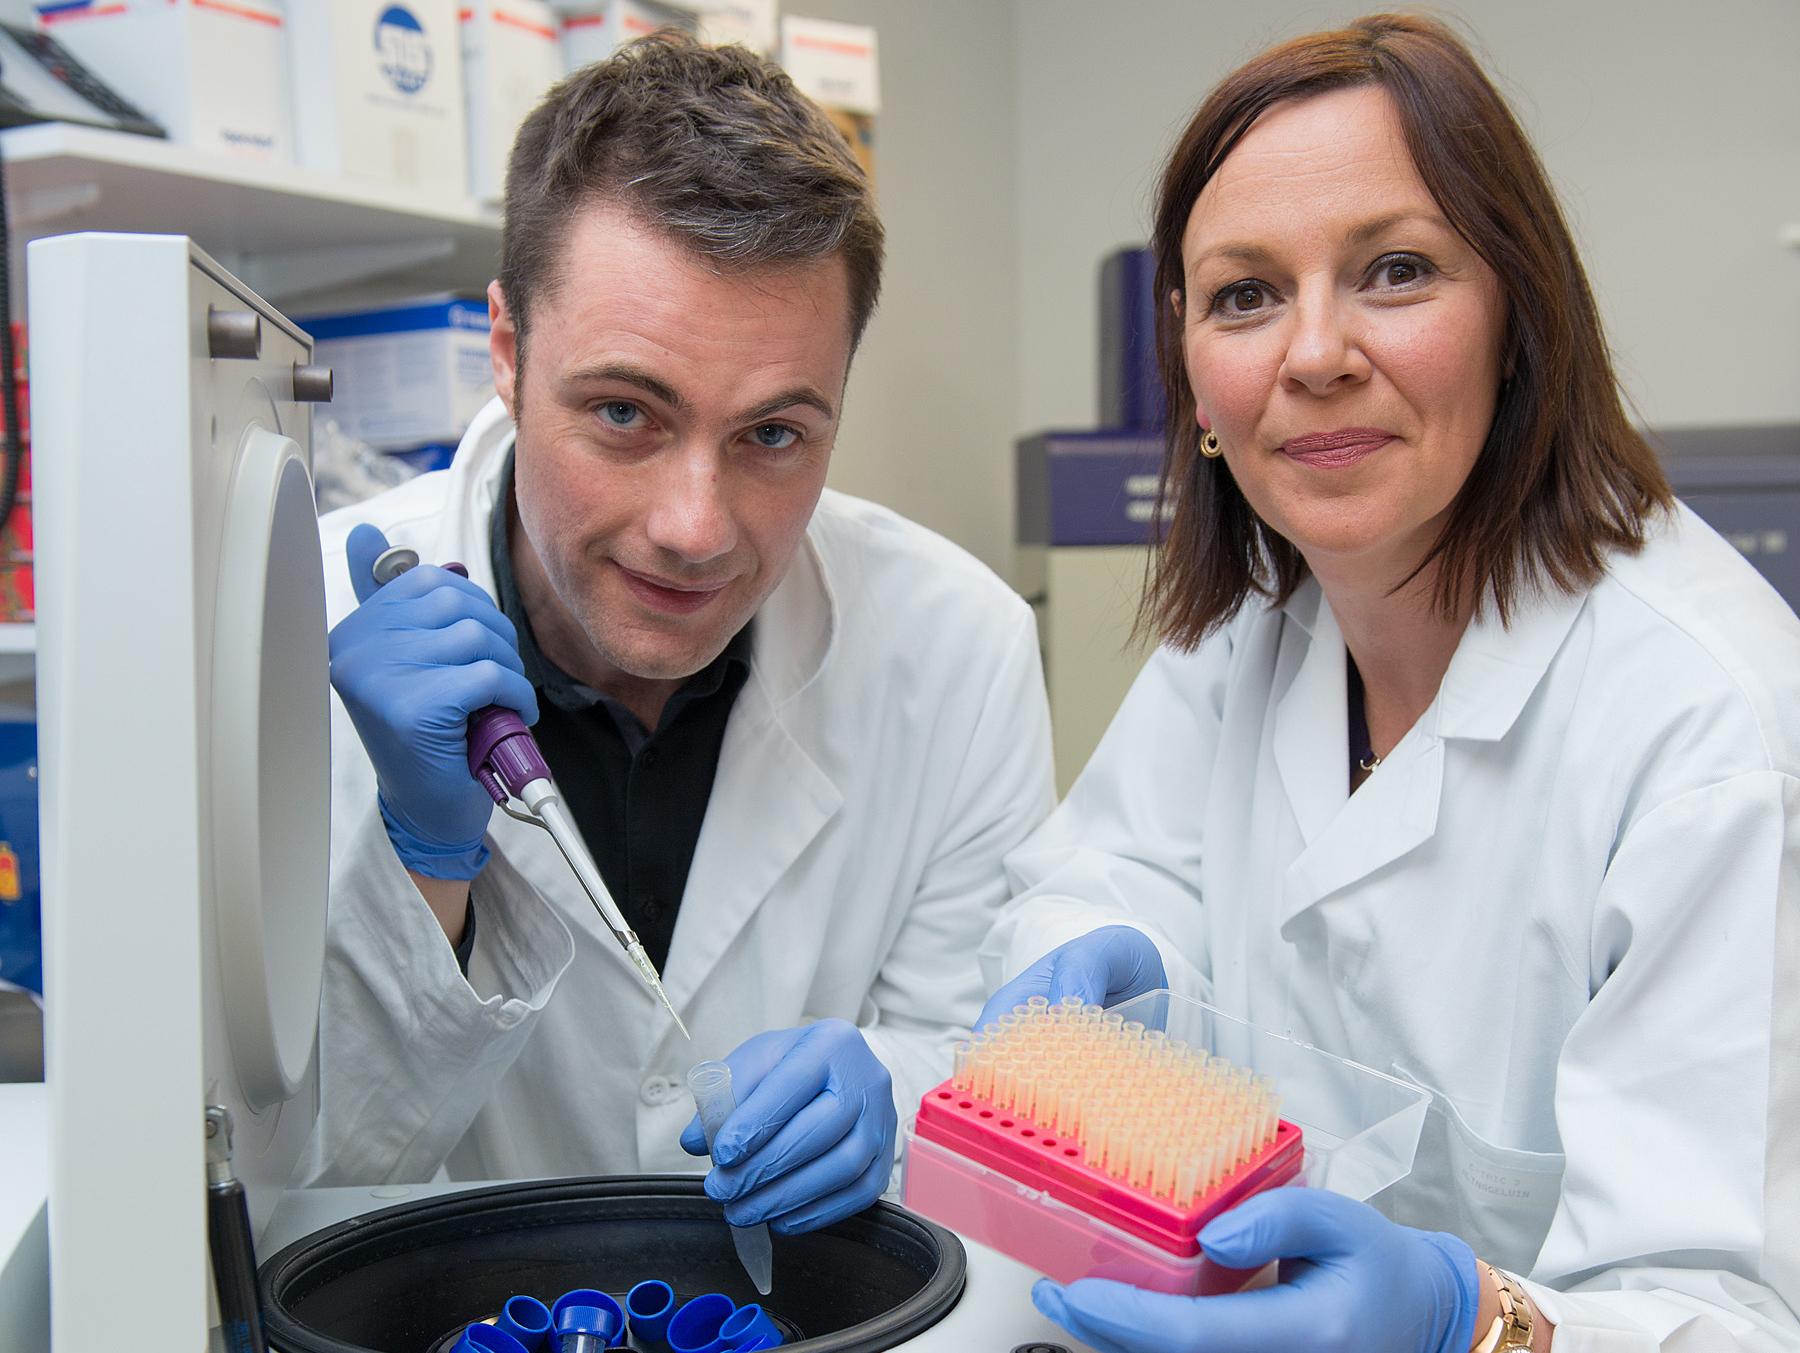 Rheumatoid arthritis patient insights to shape new Ulster University research